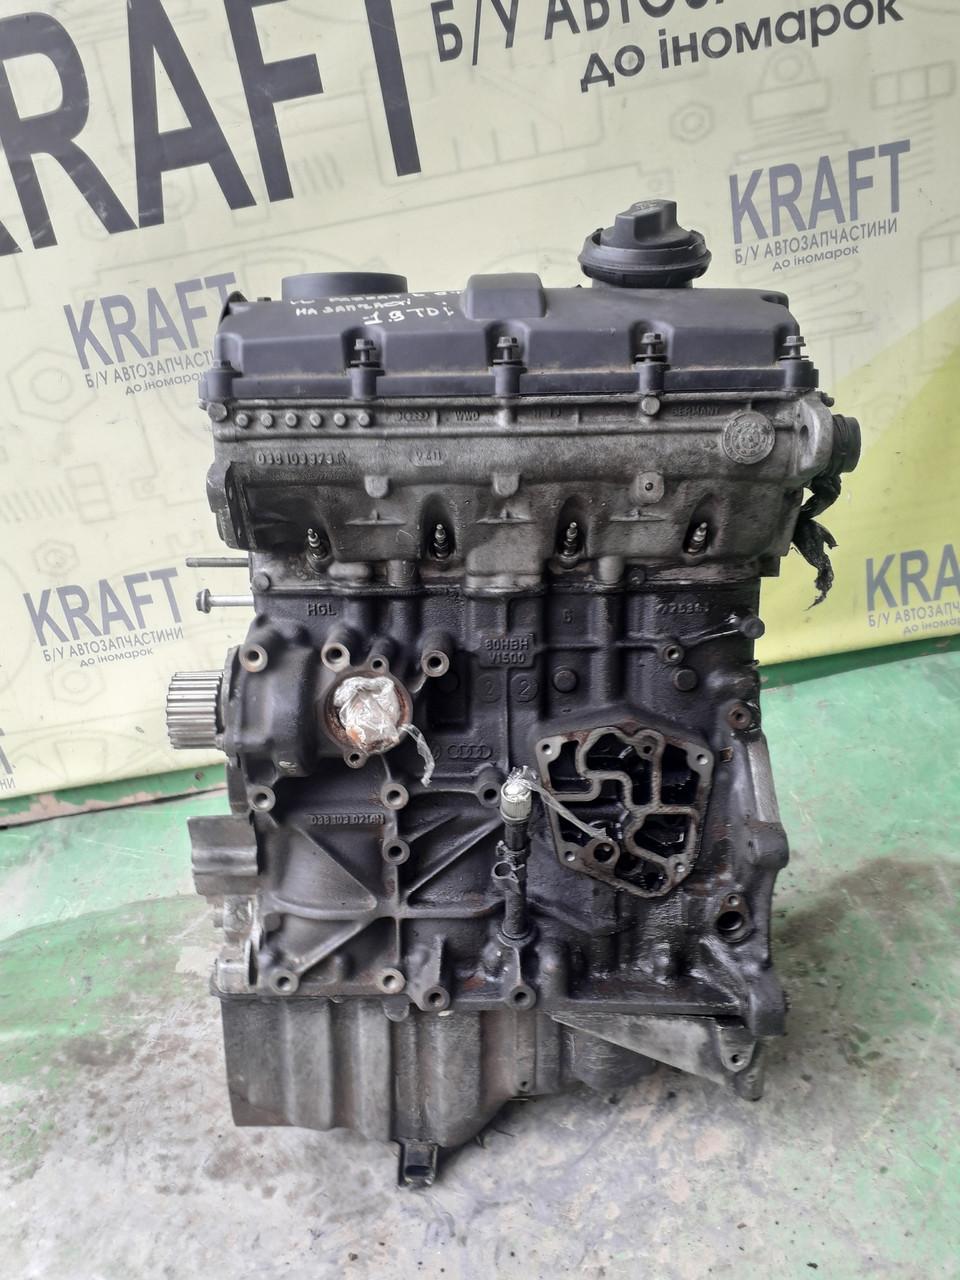 Двигатель для Volkswagen Passat B5 1.9 TDI На запчасти !!! Роспредвала нету!